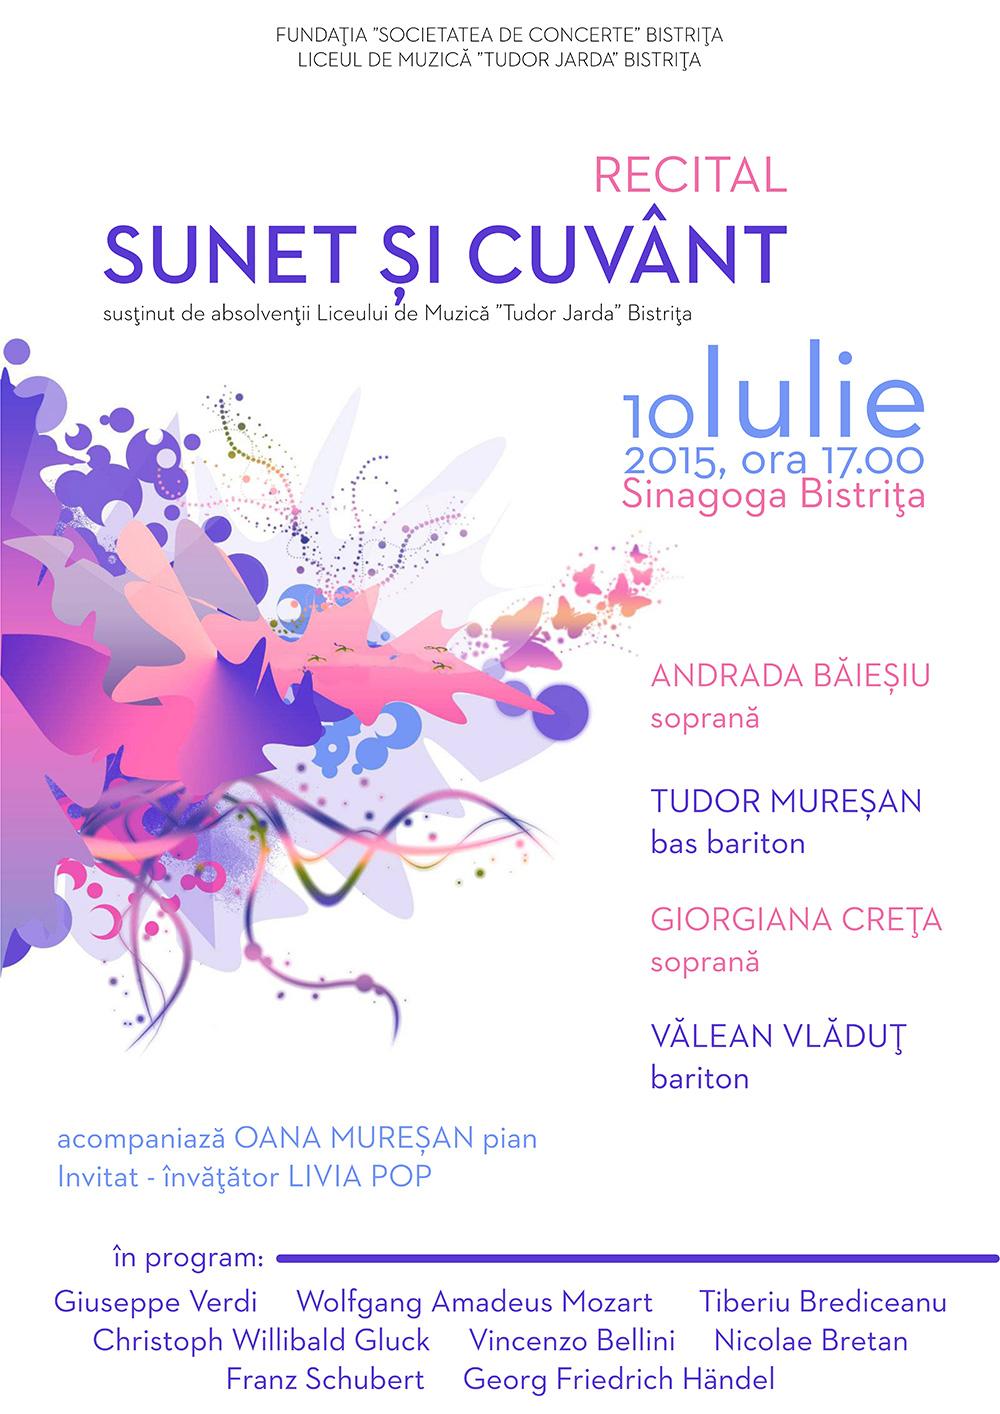 poster-recital-sunet-si-cuvant